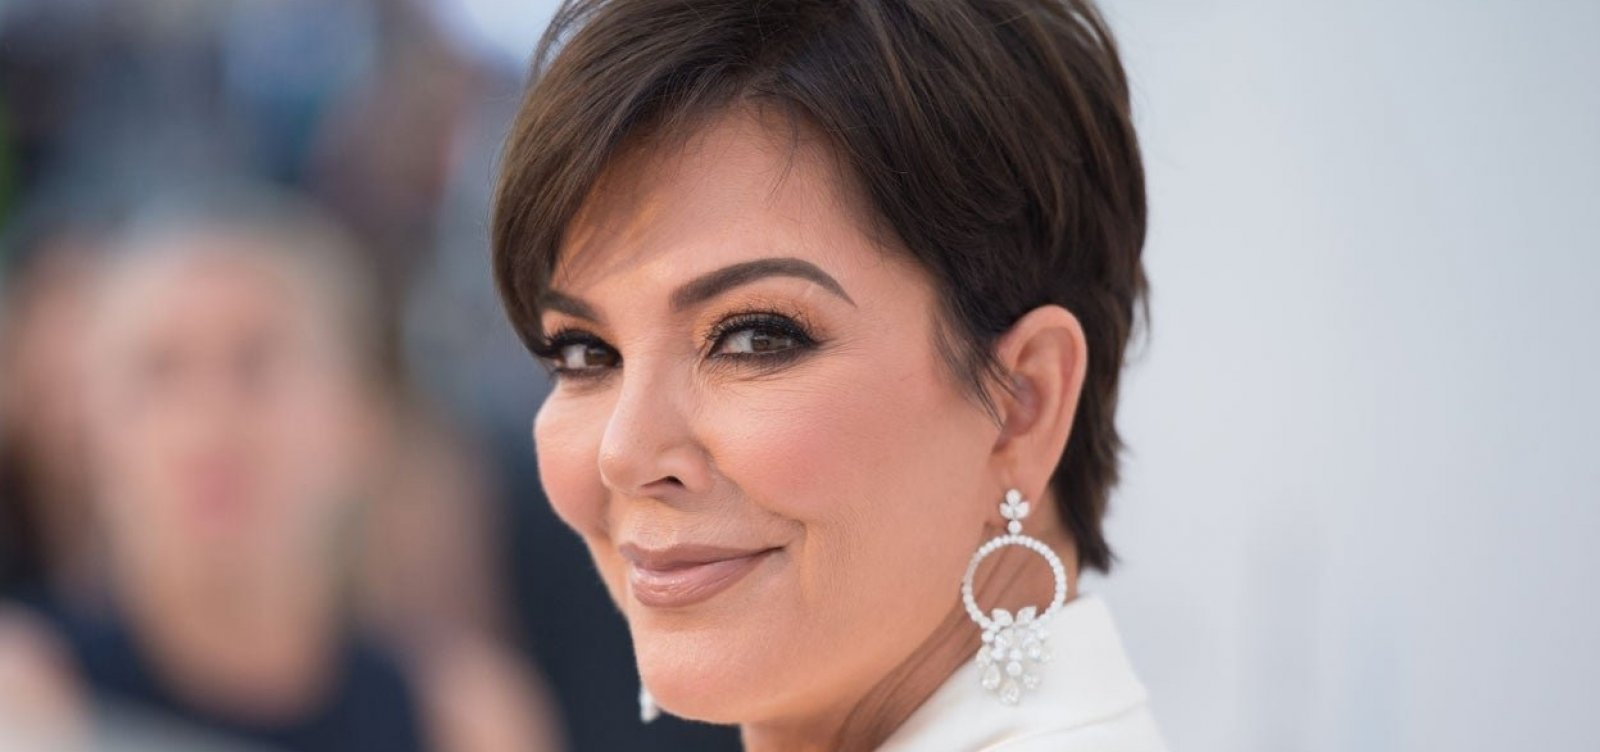 [Segurança acusa Kris Jenner, mãe de Kim Kardashian, de assédio sexual]